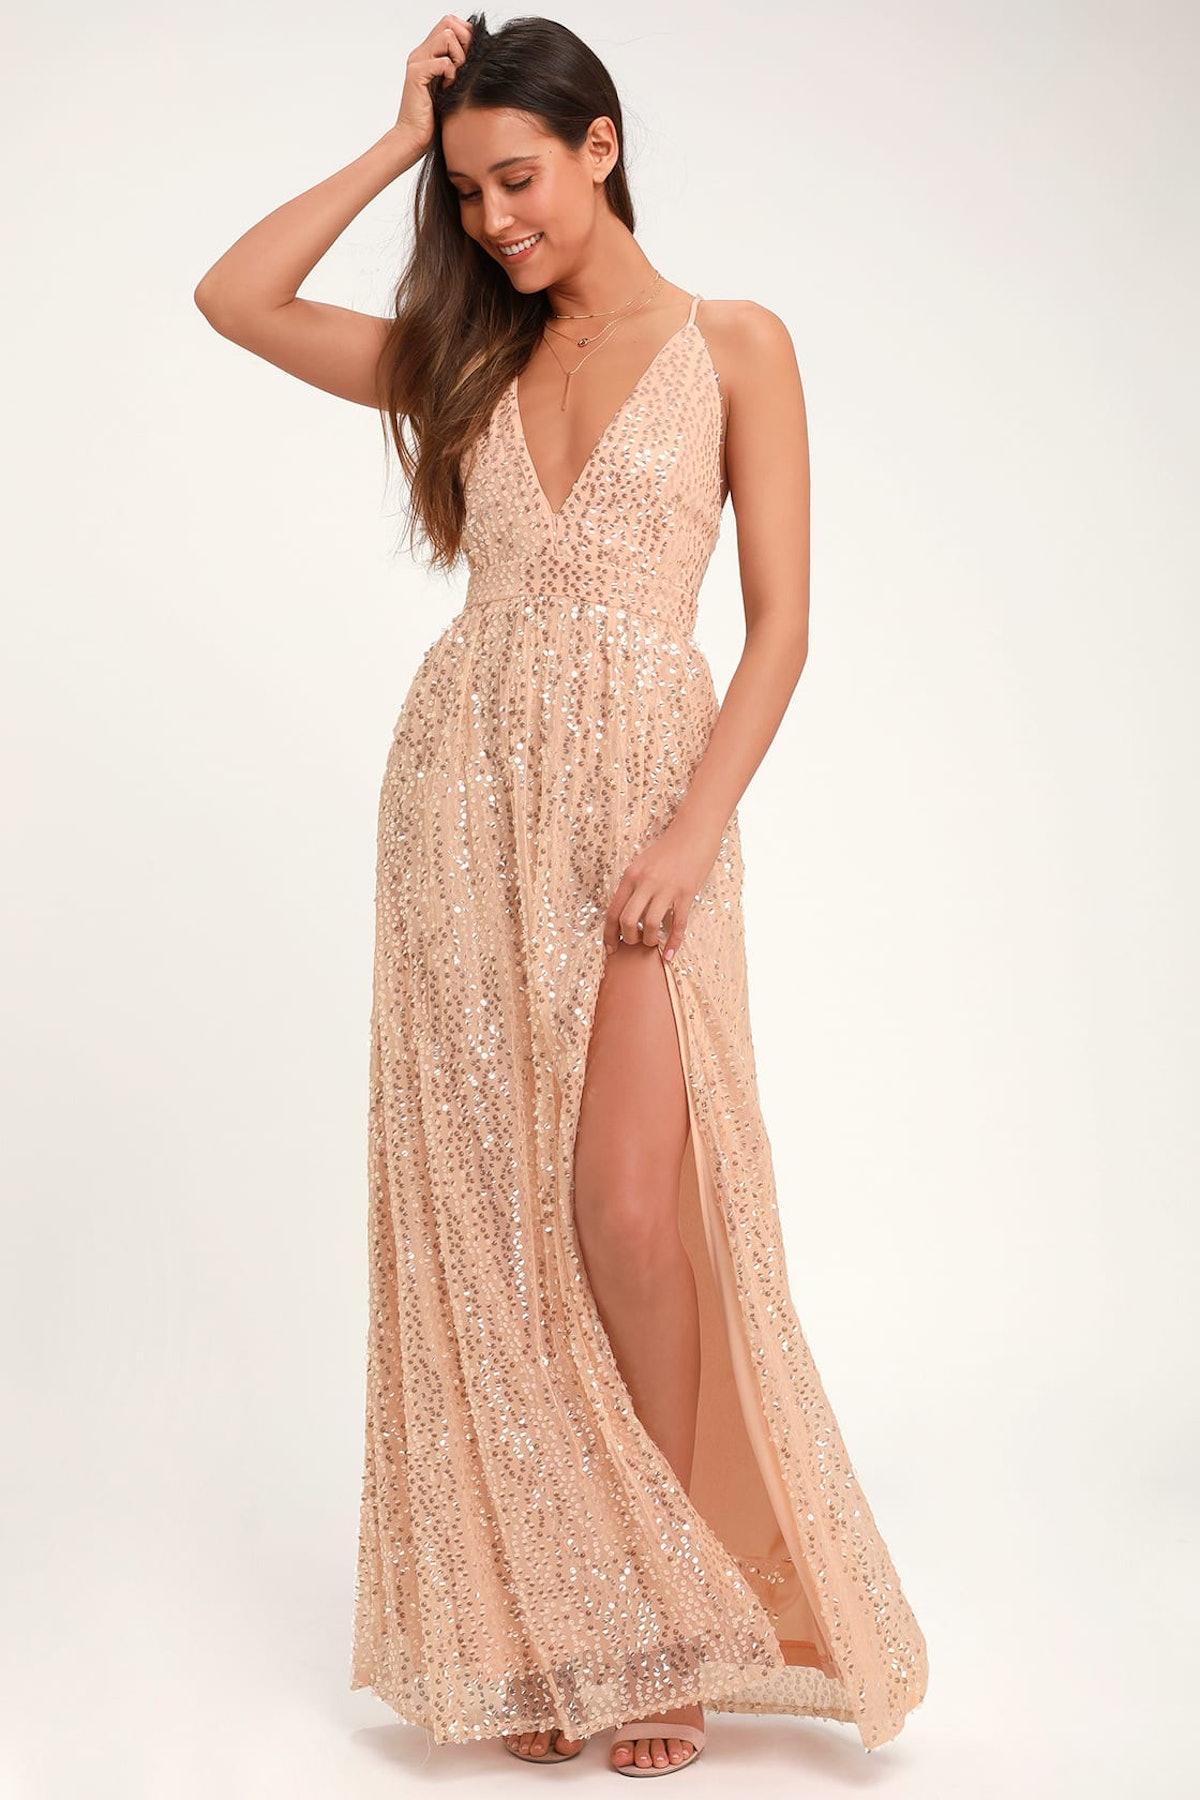 Jane Ann Blush Pink Sequin Maxi Dress